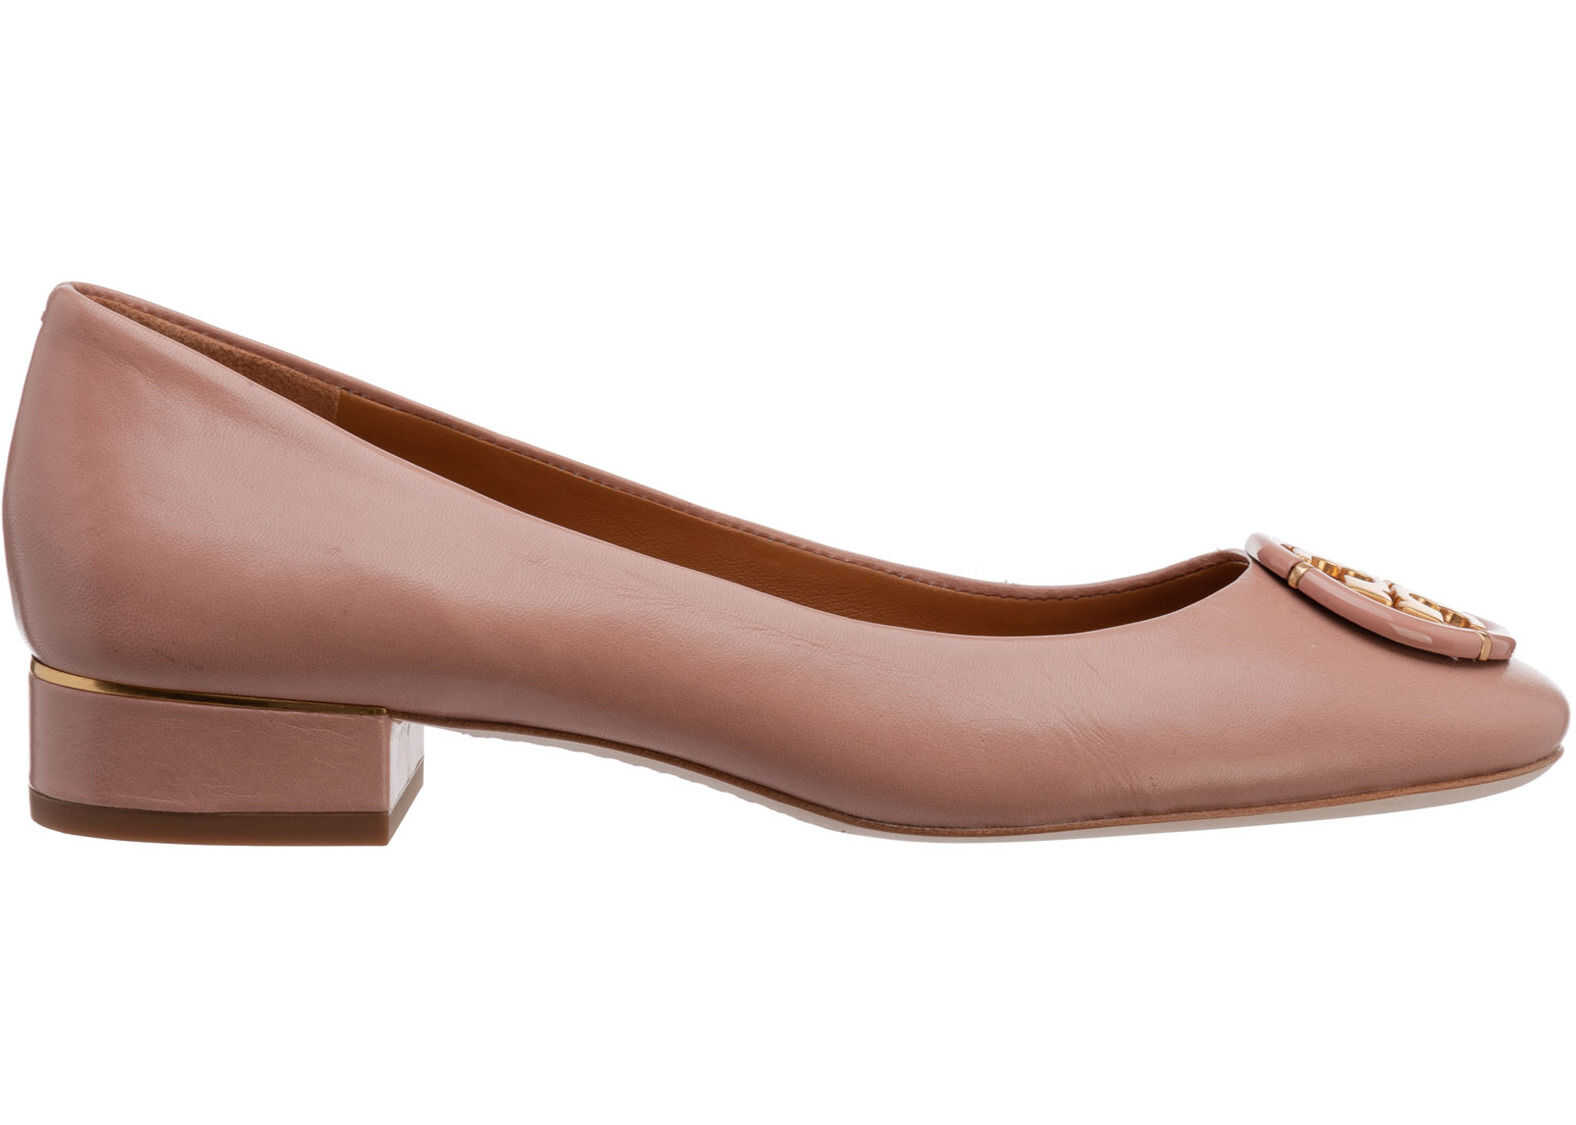 Tory Burch Flats Ballerinas 79548689 Pink imagine b-mall.ro